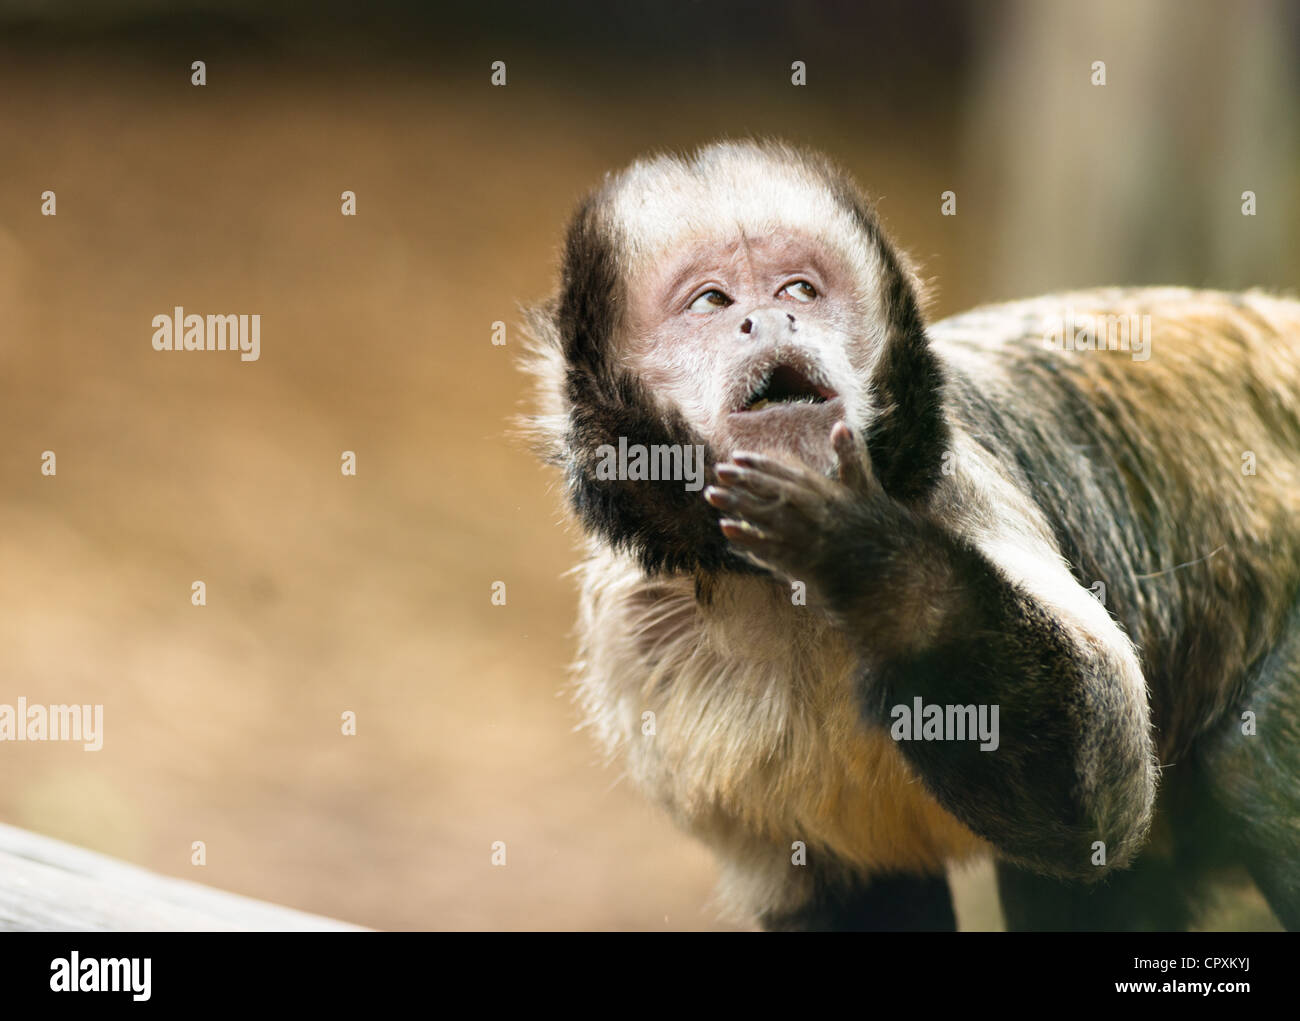 Tufted capuchin monkey (Sapajus apella) with cheeky expression. - Stock Image